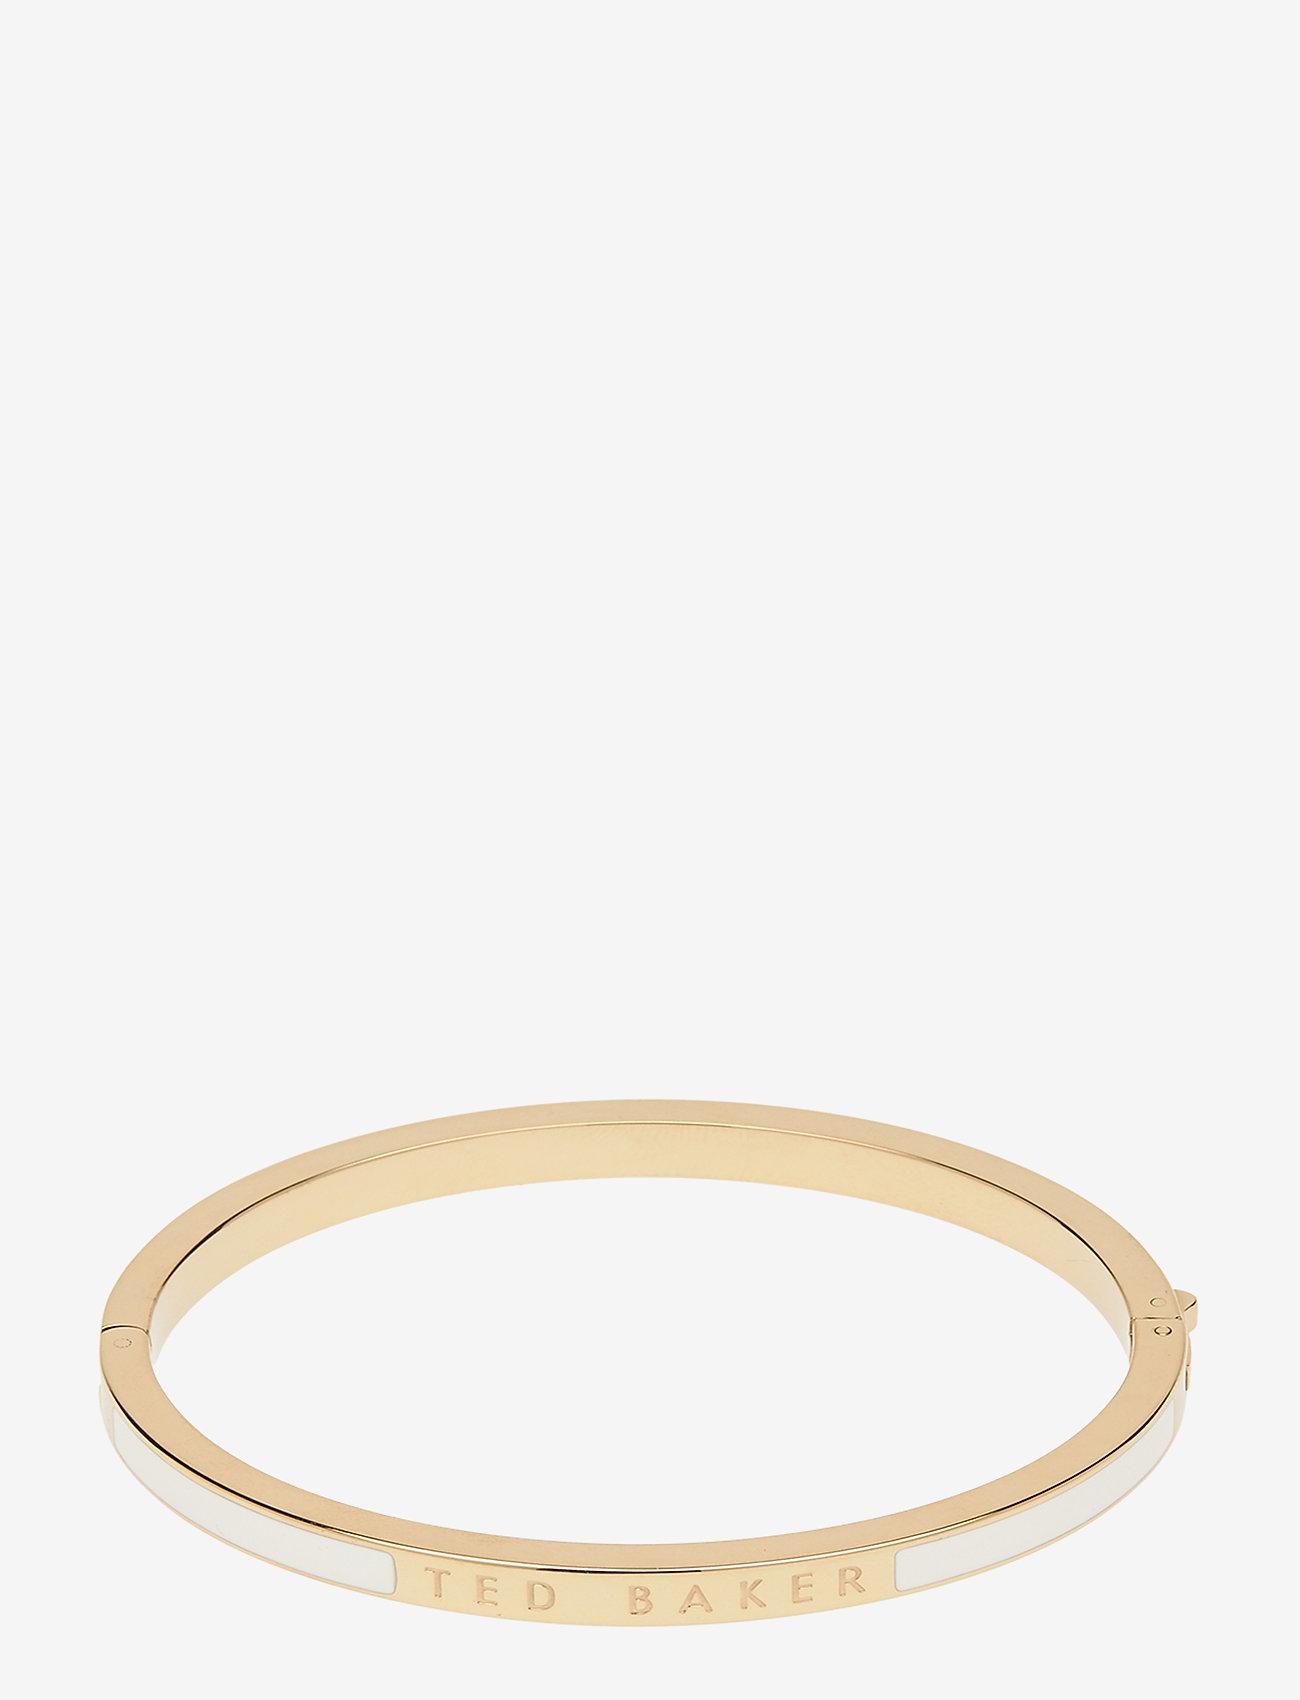 Ted Baker - ELEMARA - bangles - gold/white - 0